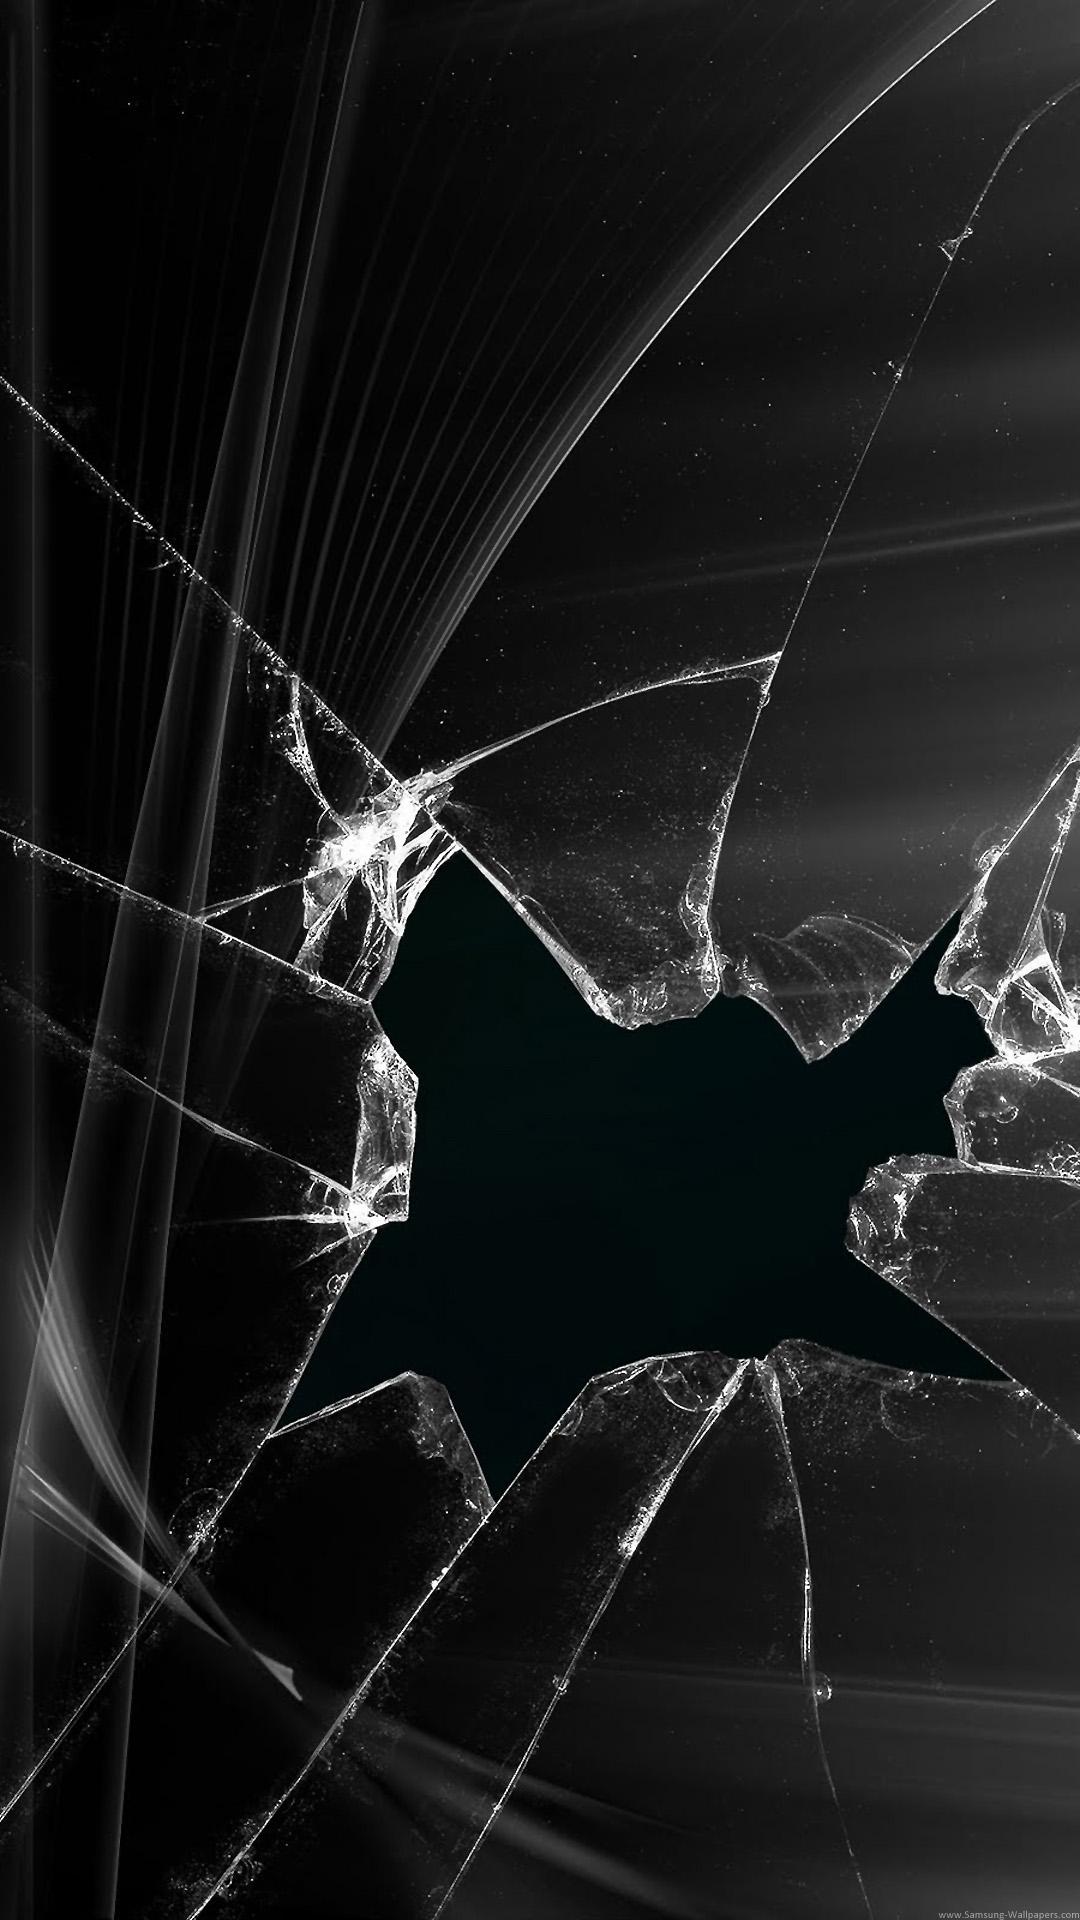 Broken, Screen, Wallpaper, Apple - Lock Screen Iphone Wallpaper Hd - HD Wallpaper